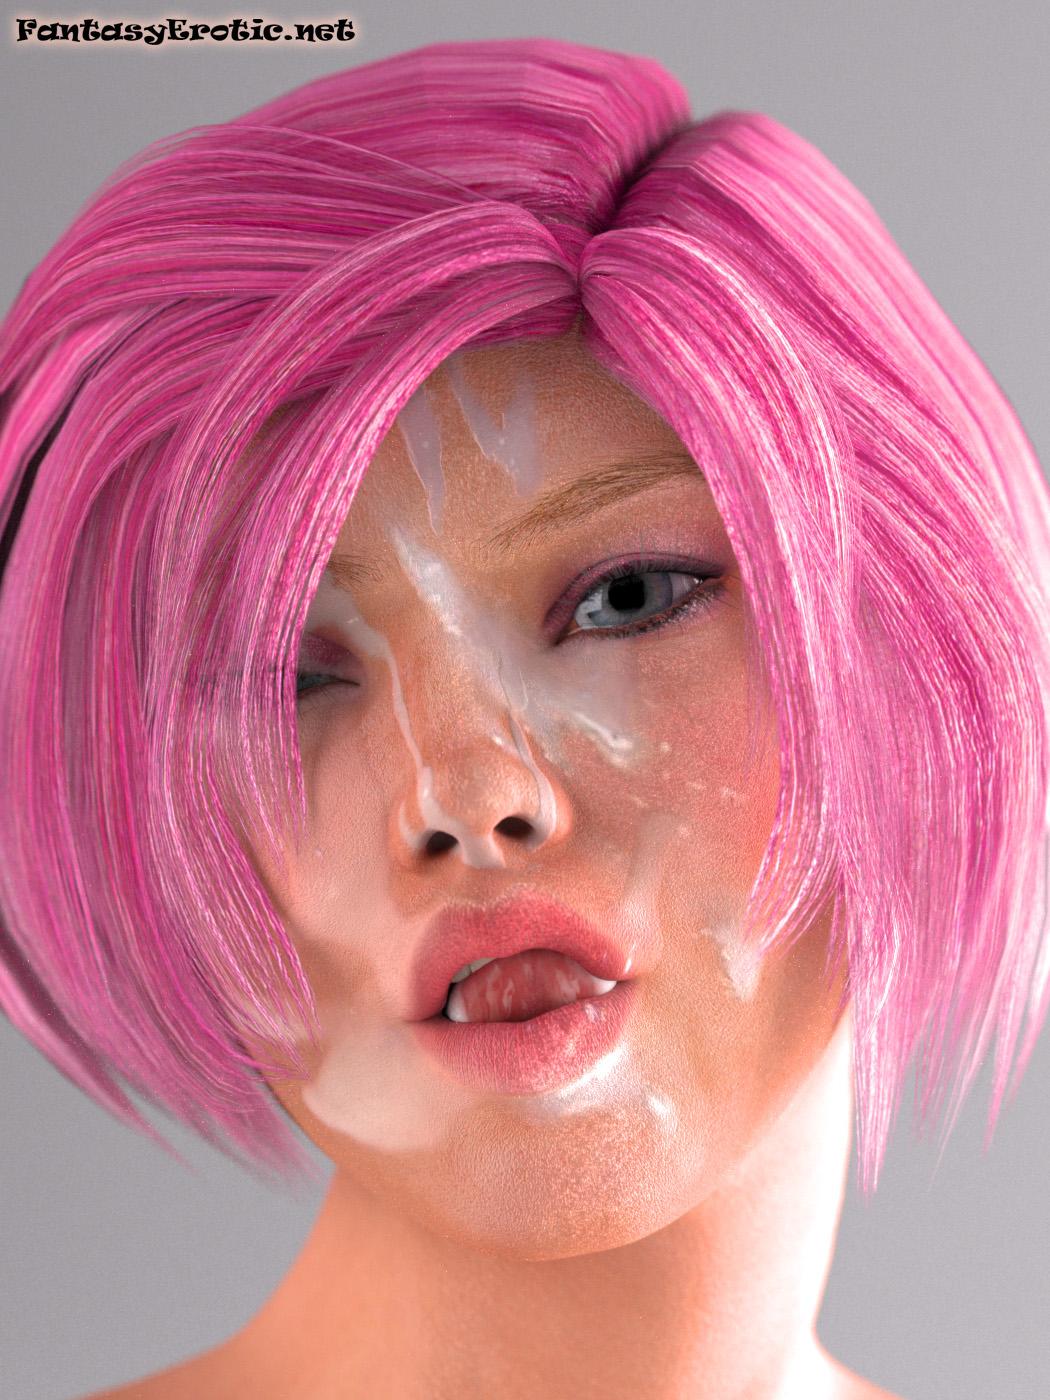 Miranda Odoto Creamed